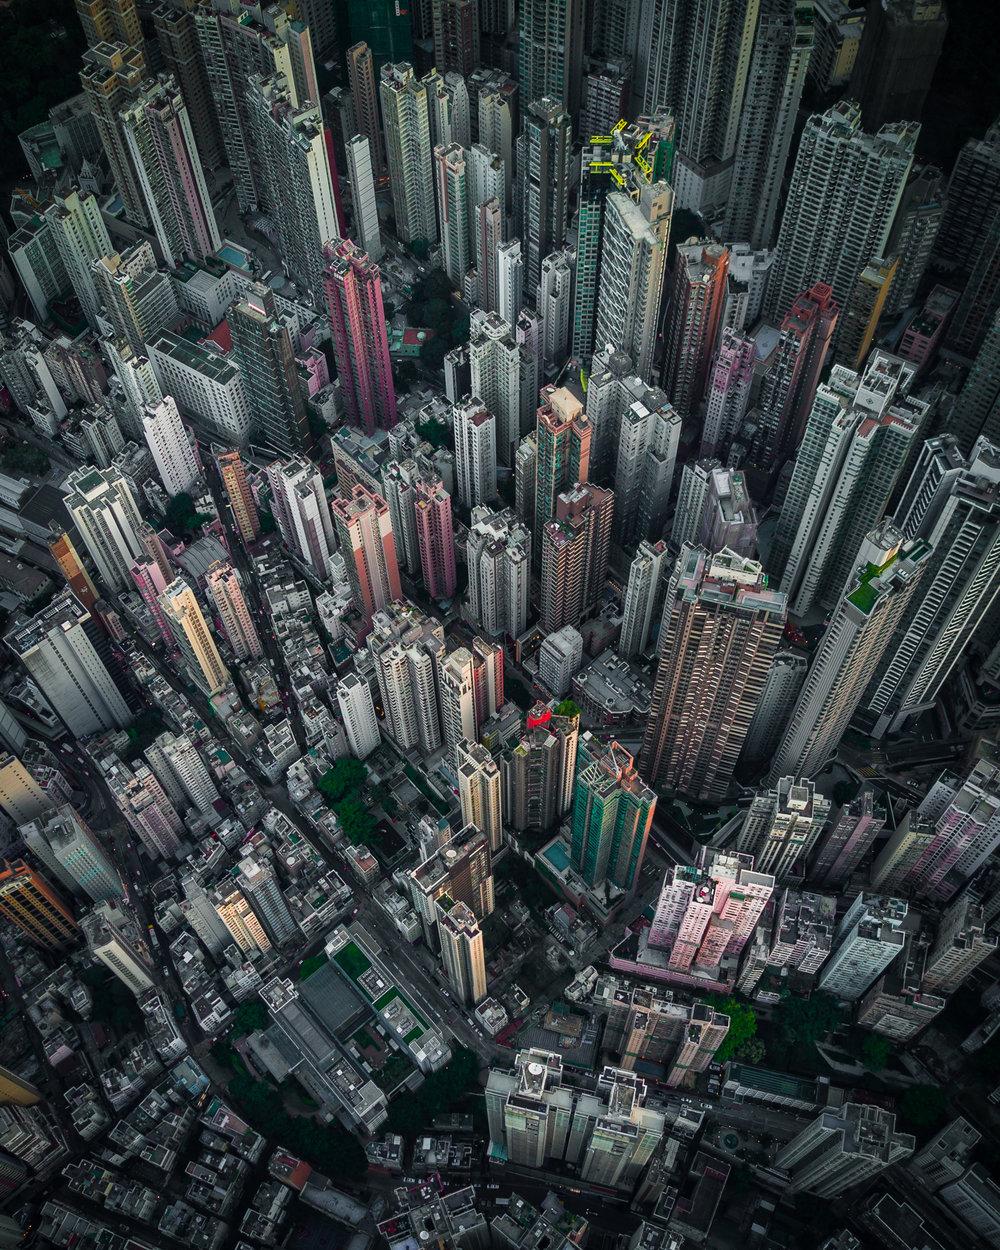 Nightsnlights_Above_HongKong01.jpg